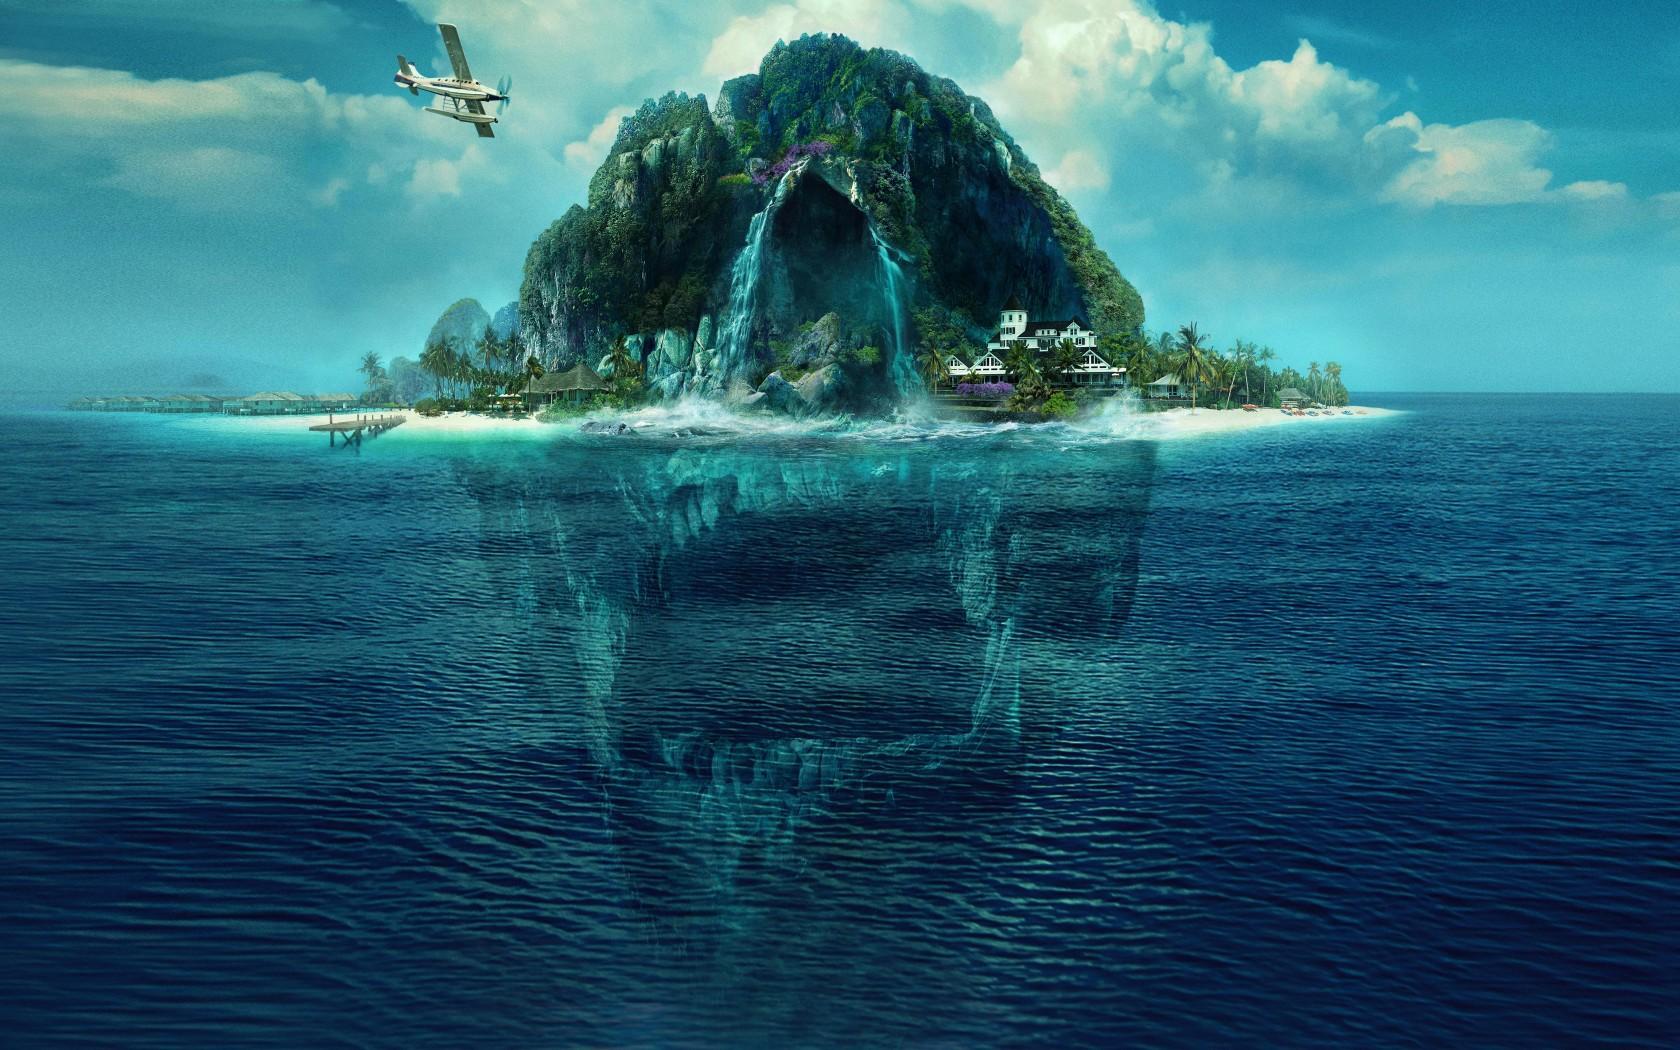 Fantasy Island 2020 4K 5K HD desktop wallpaper Widescreen High 1680x1050